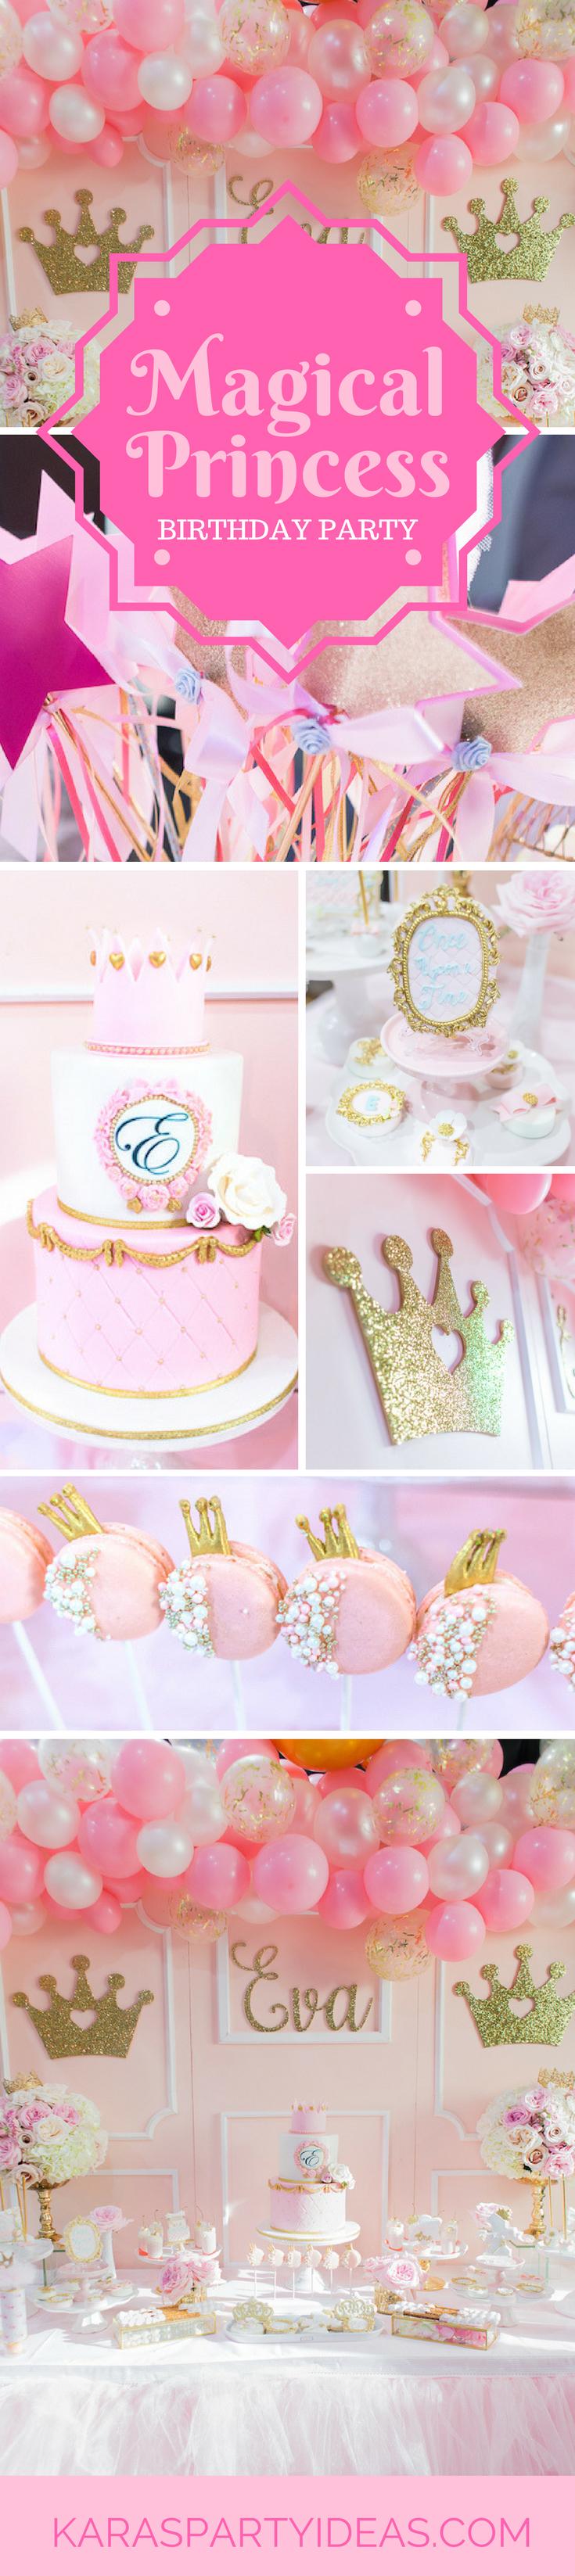 magical princess party via Kara's Party Ideas